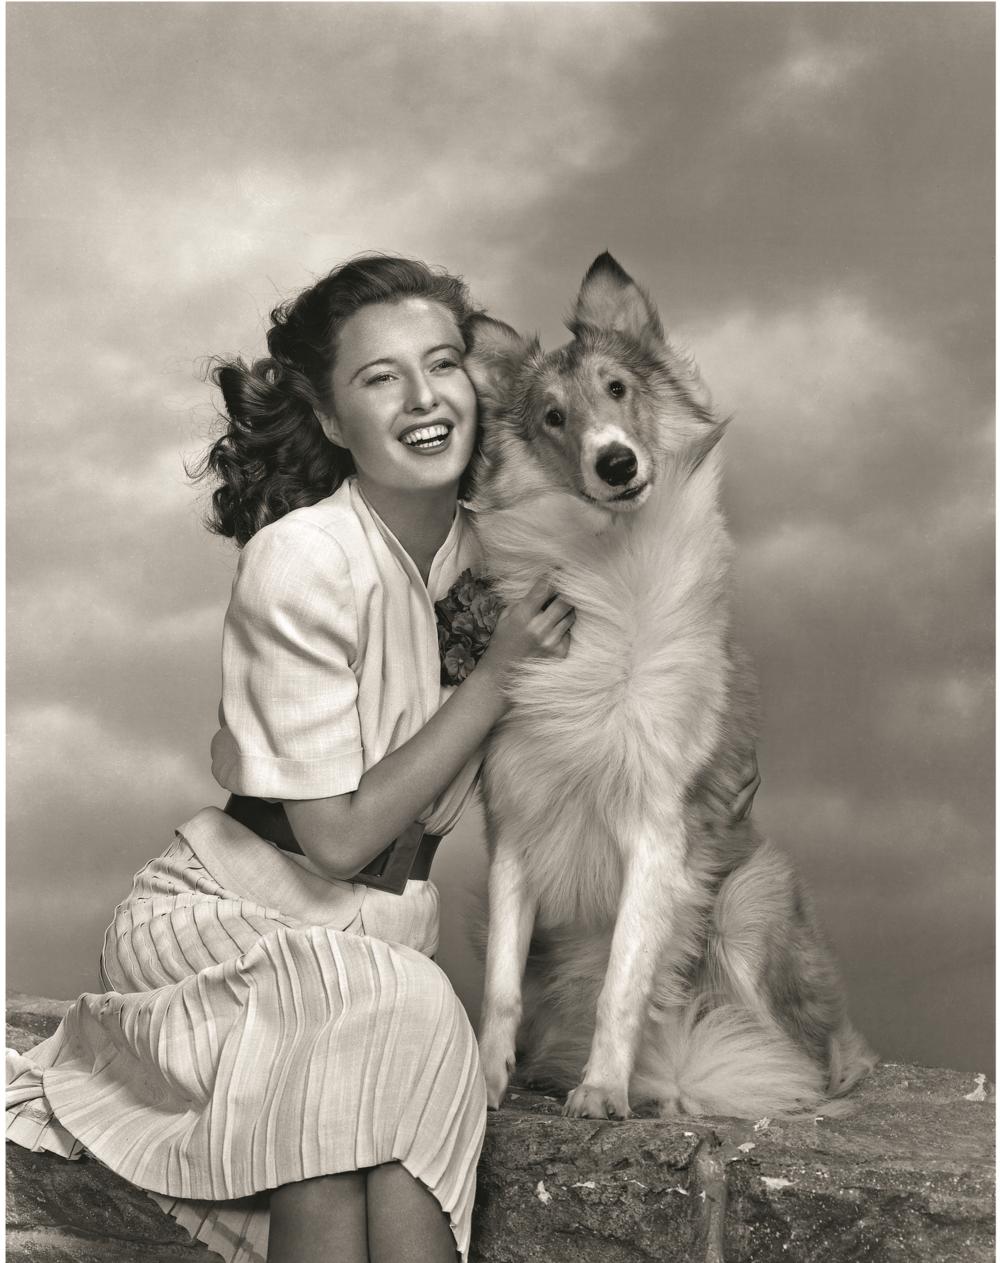 Barbara Stanwyck, RKO, 1936